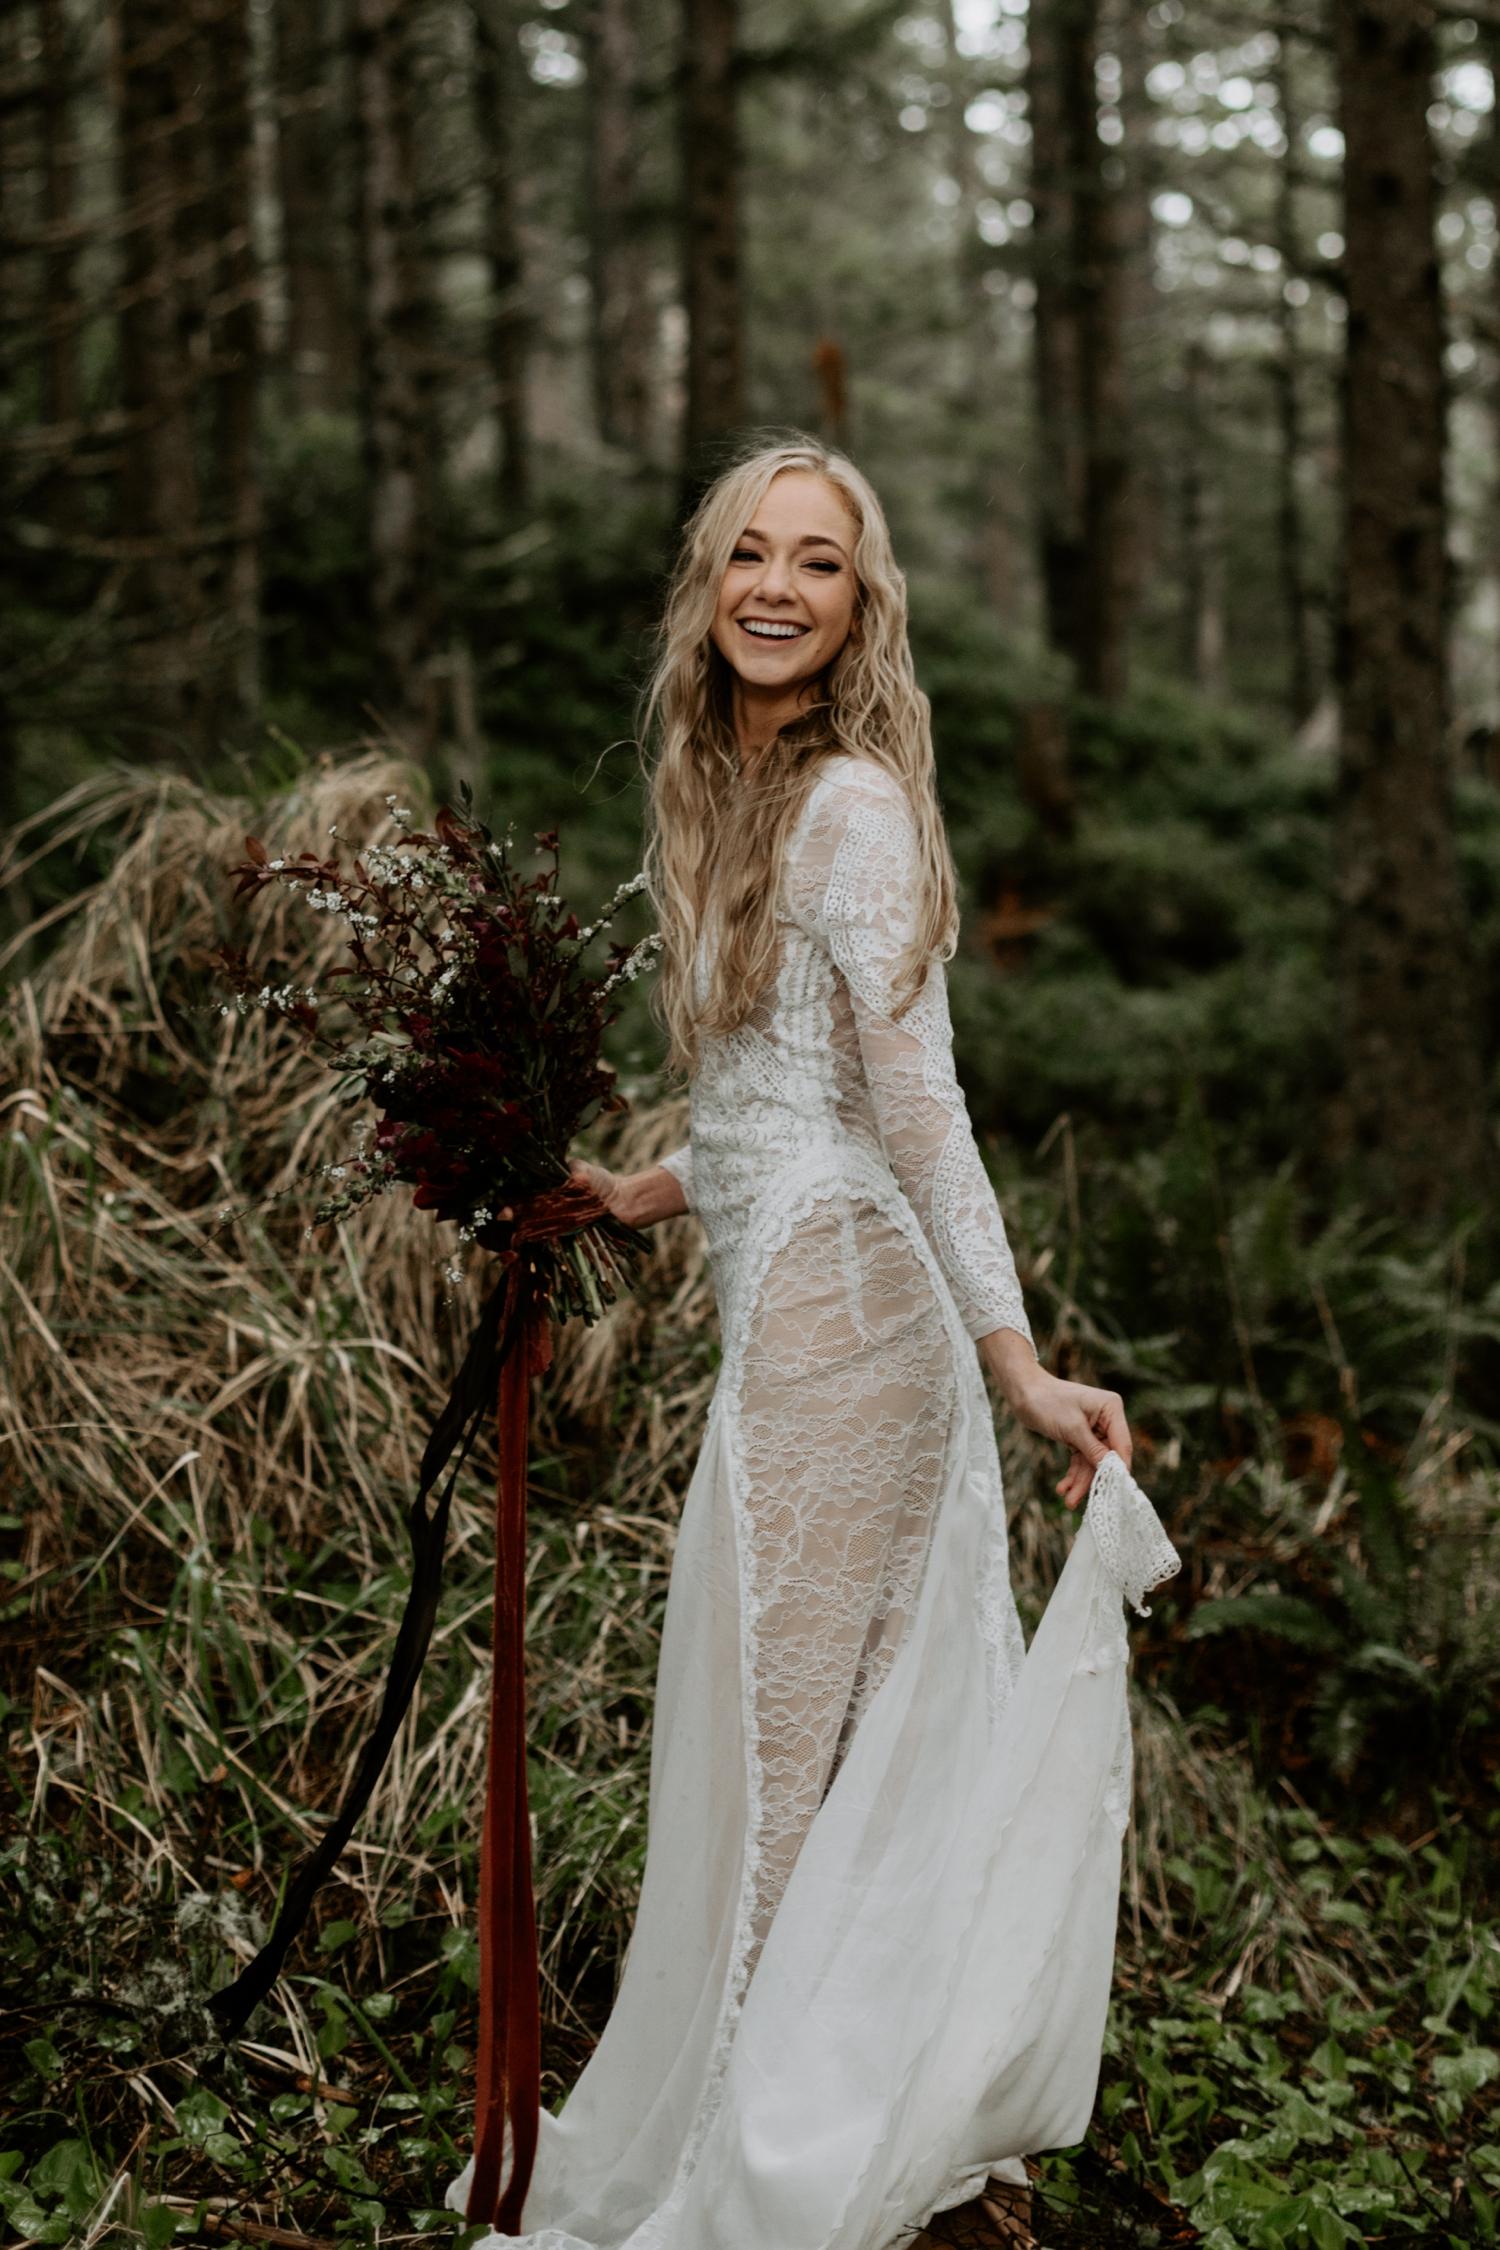 ecola-state-park-elopement-2018-05-02_0051.jpg